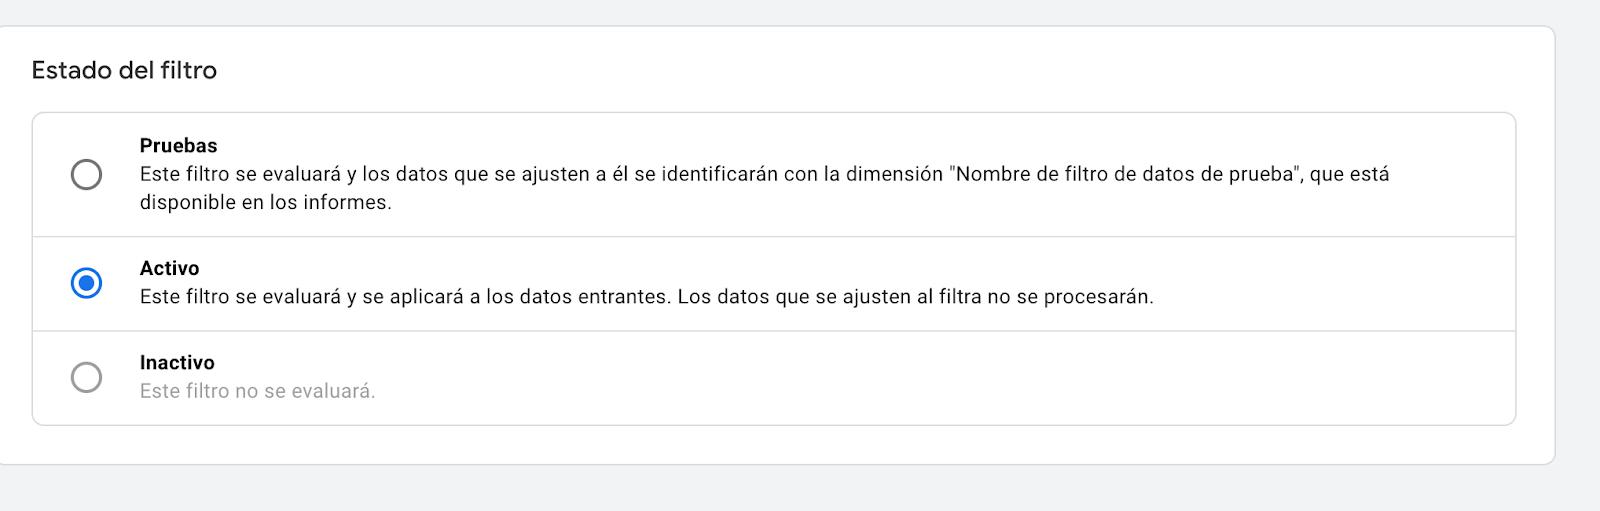 Activar Filtro de Google Analytics 4